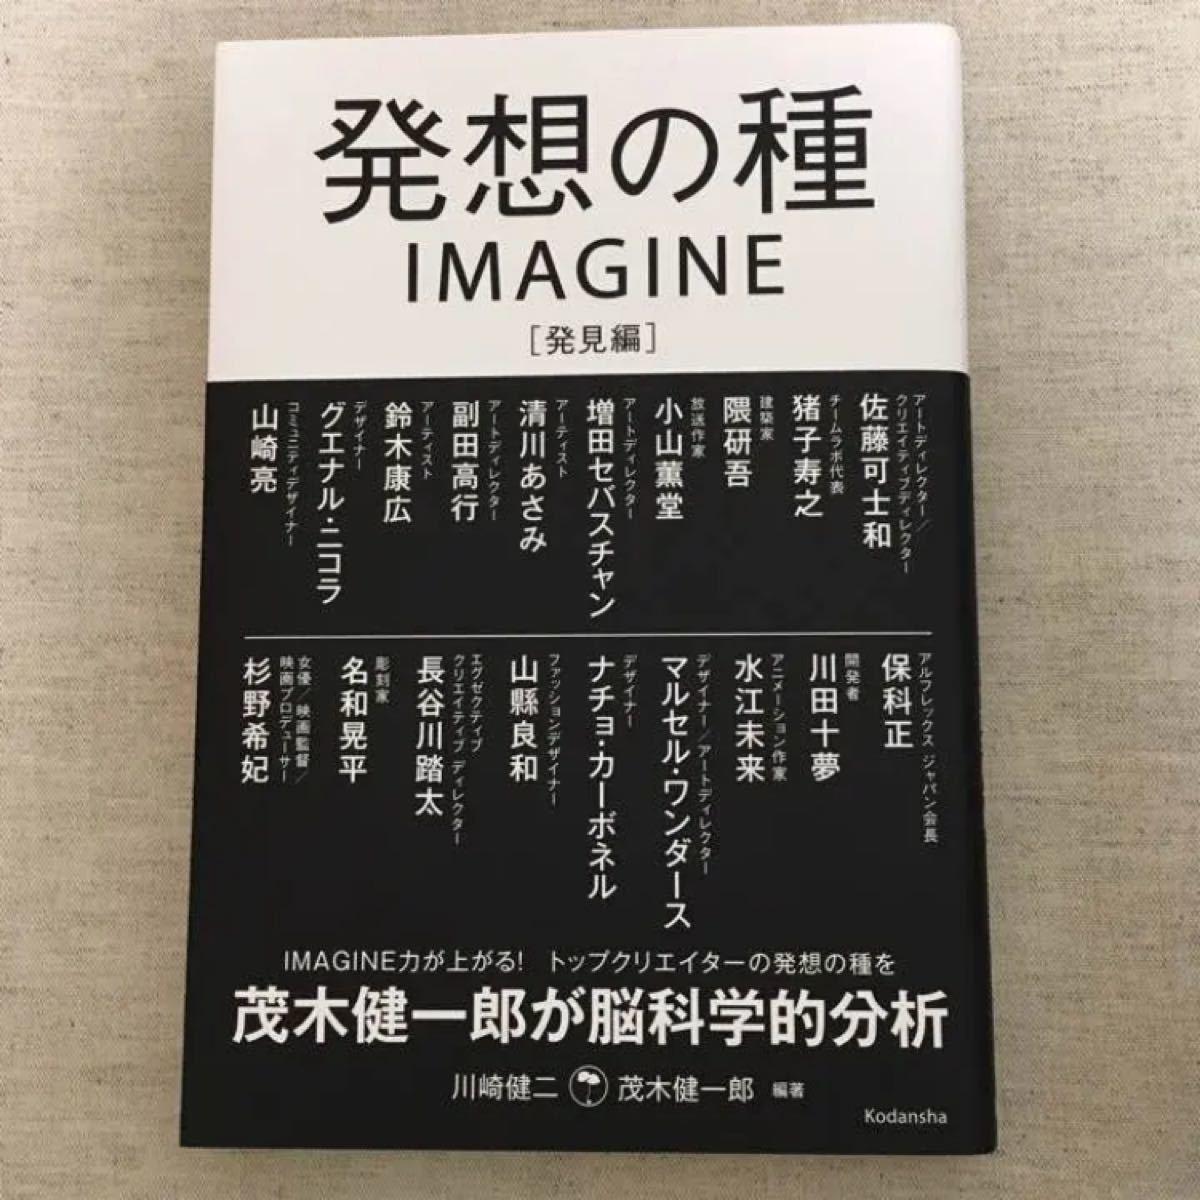 発想の種 IMAGINE 川崎健二 茂木健一郎